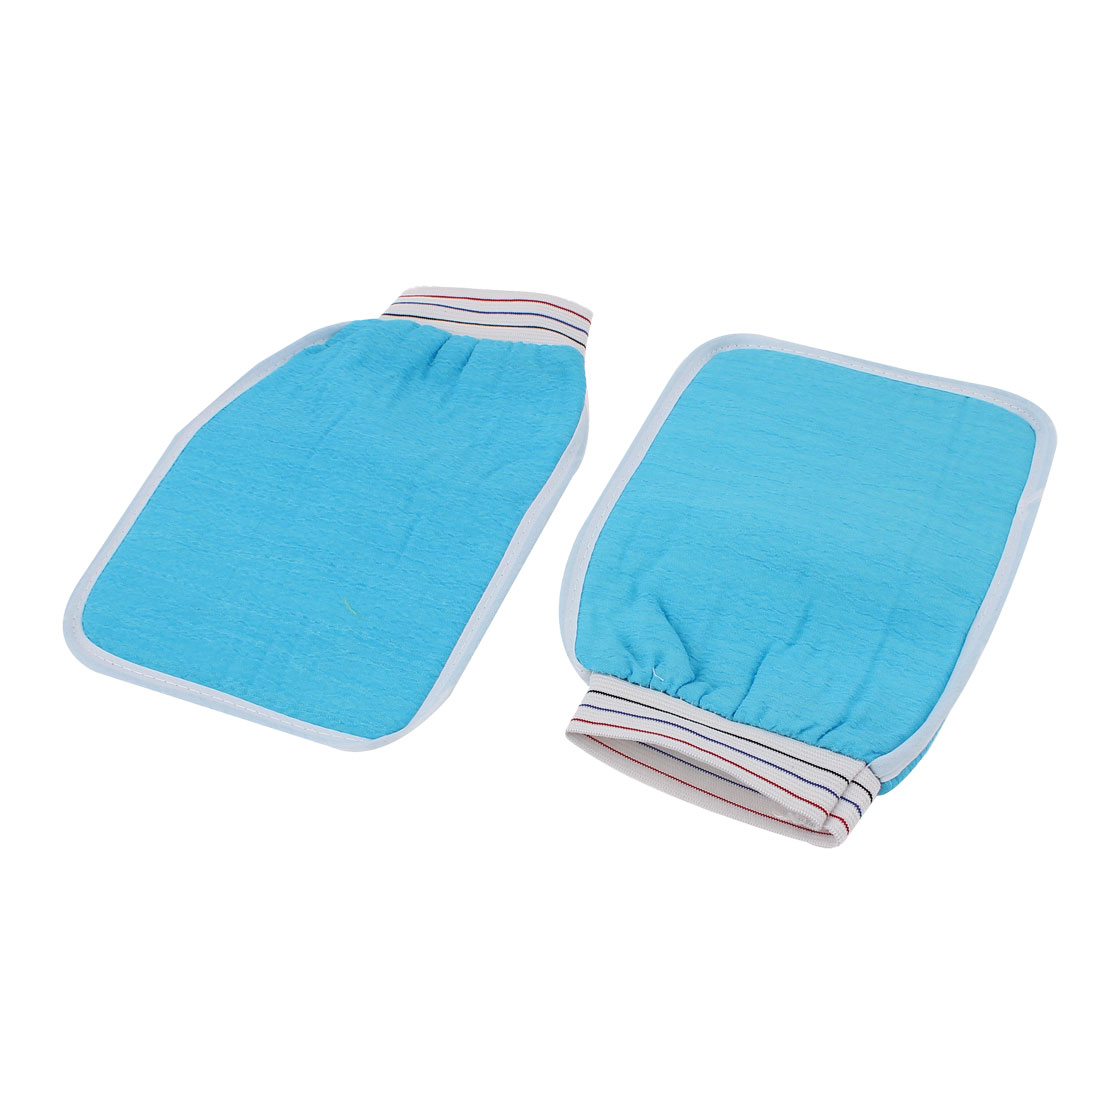 Elastic Cuff Double Side Shower Bath Wash Massage Glove Scrubber Blue 2pcs